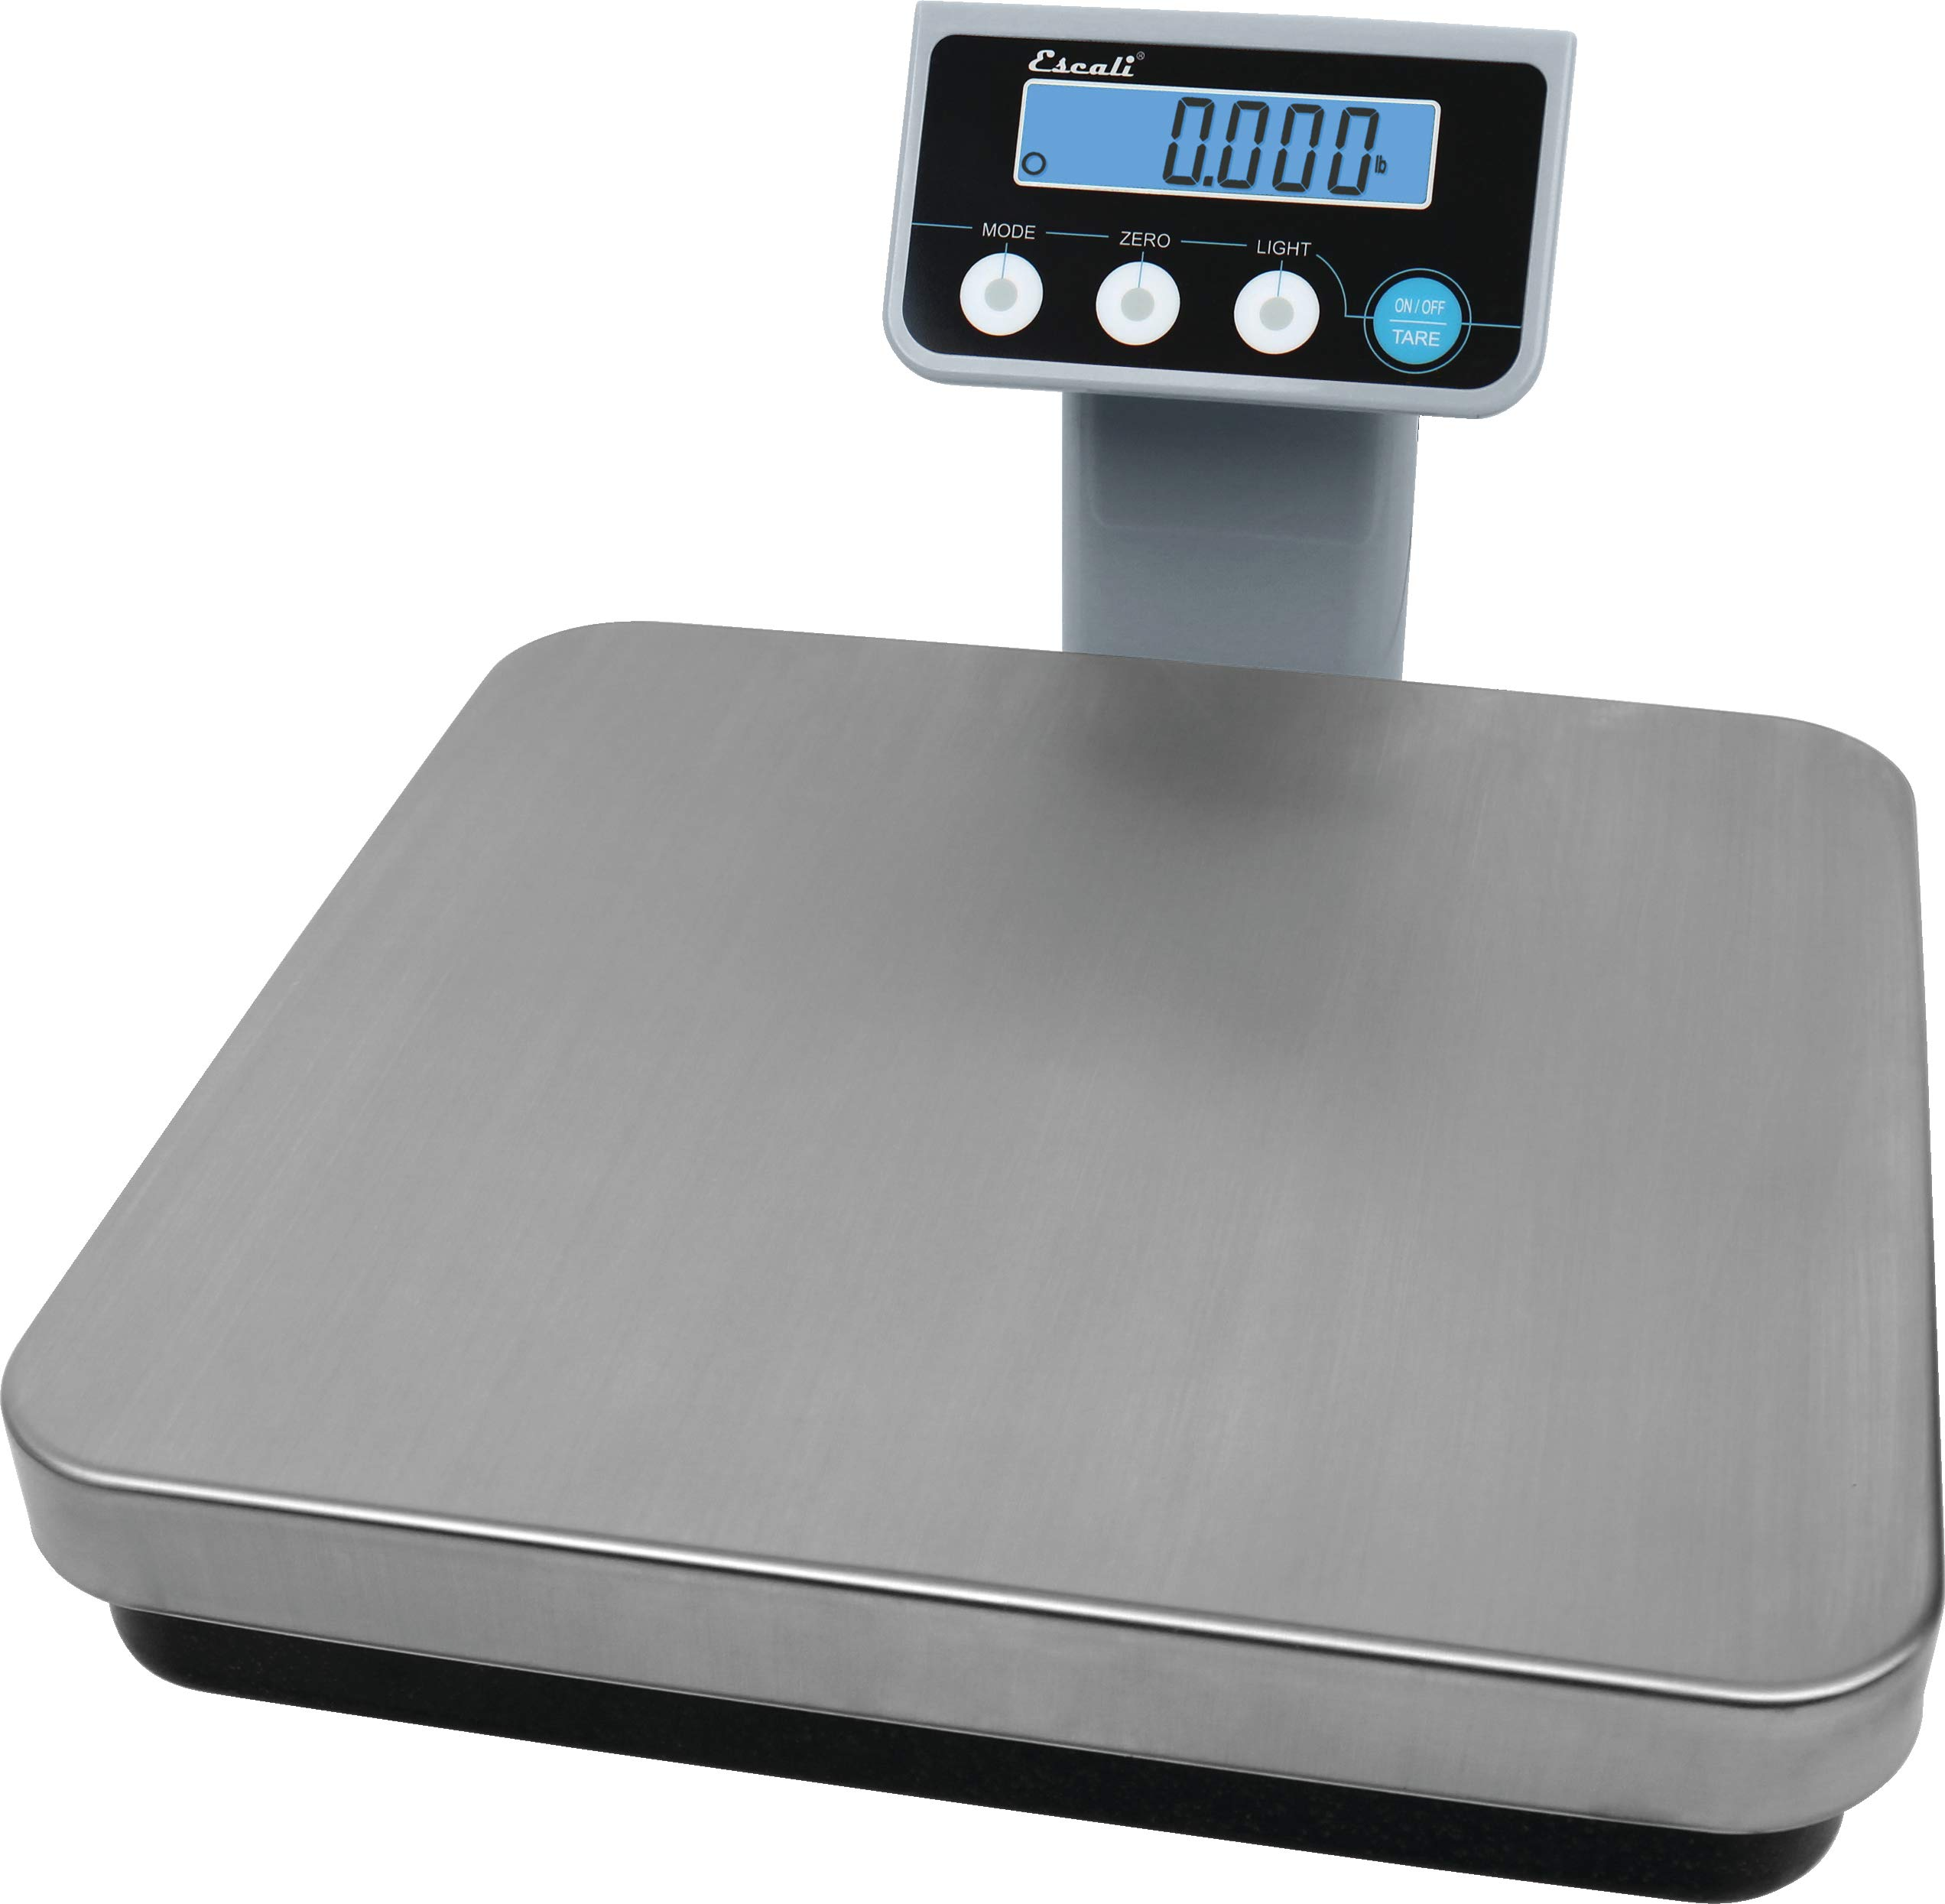 San Jamar SCDGPC13 Large Portion Control Digital Food/Kitchen Scale, 13 lb Capacity